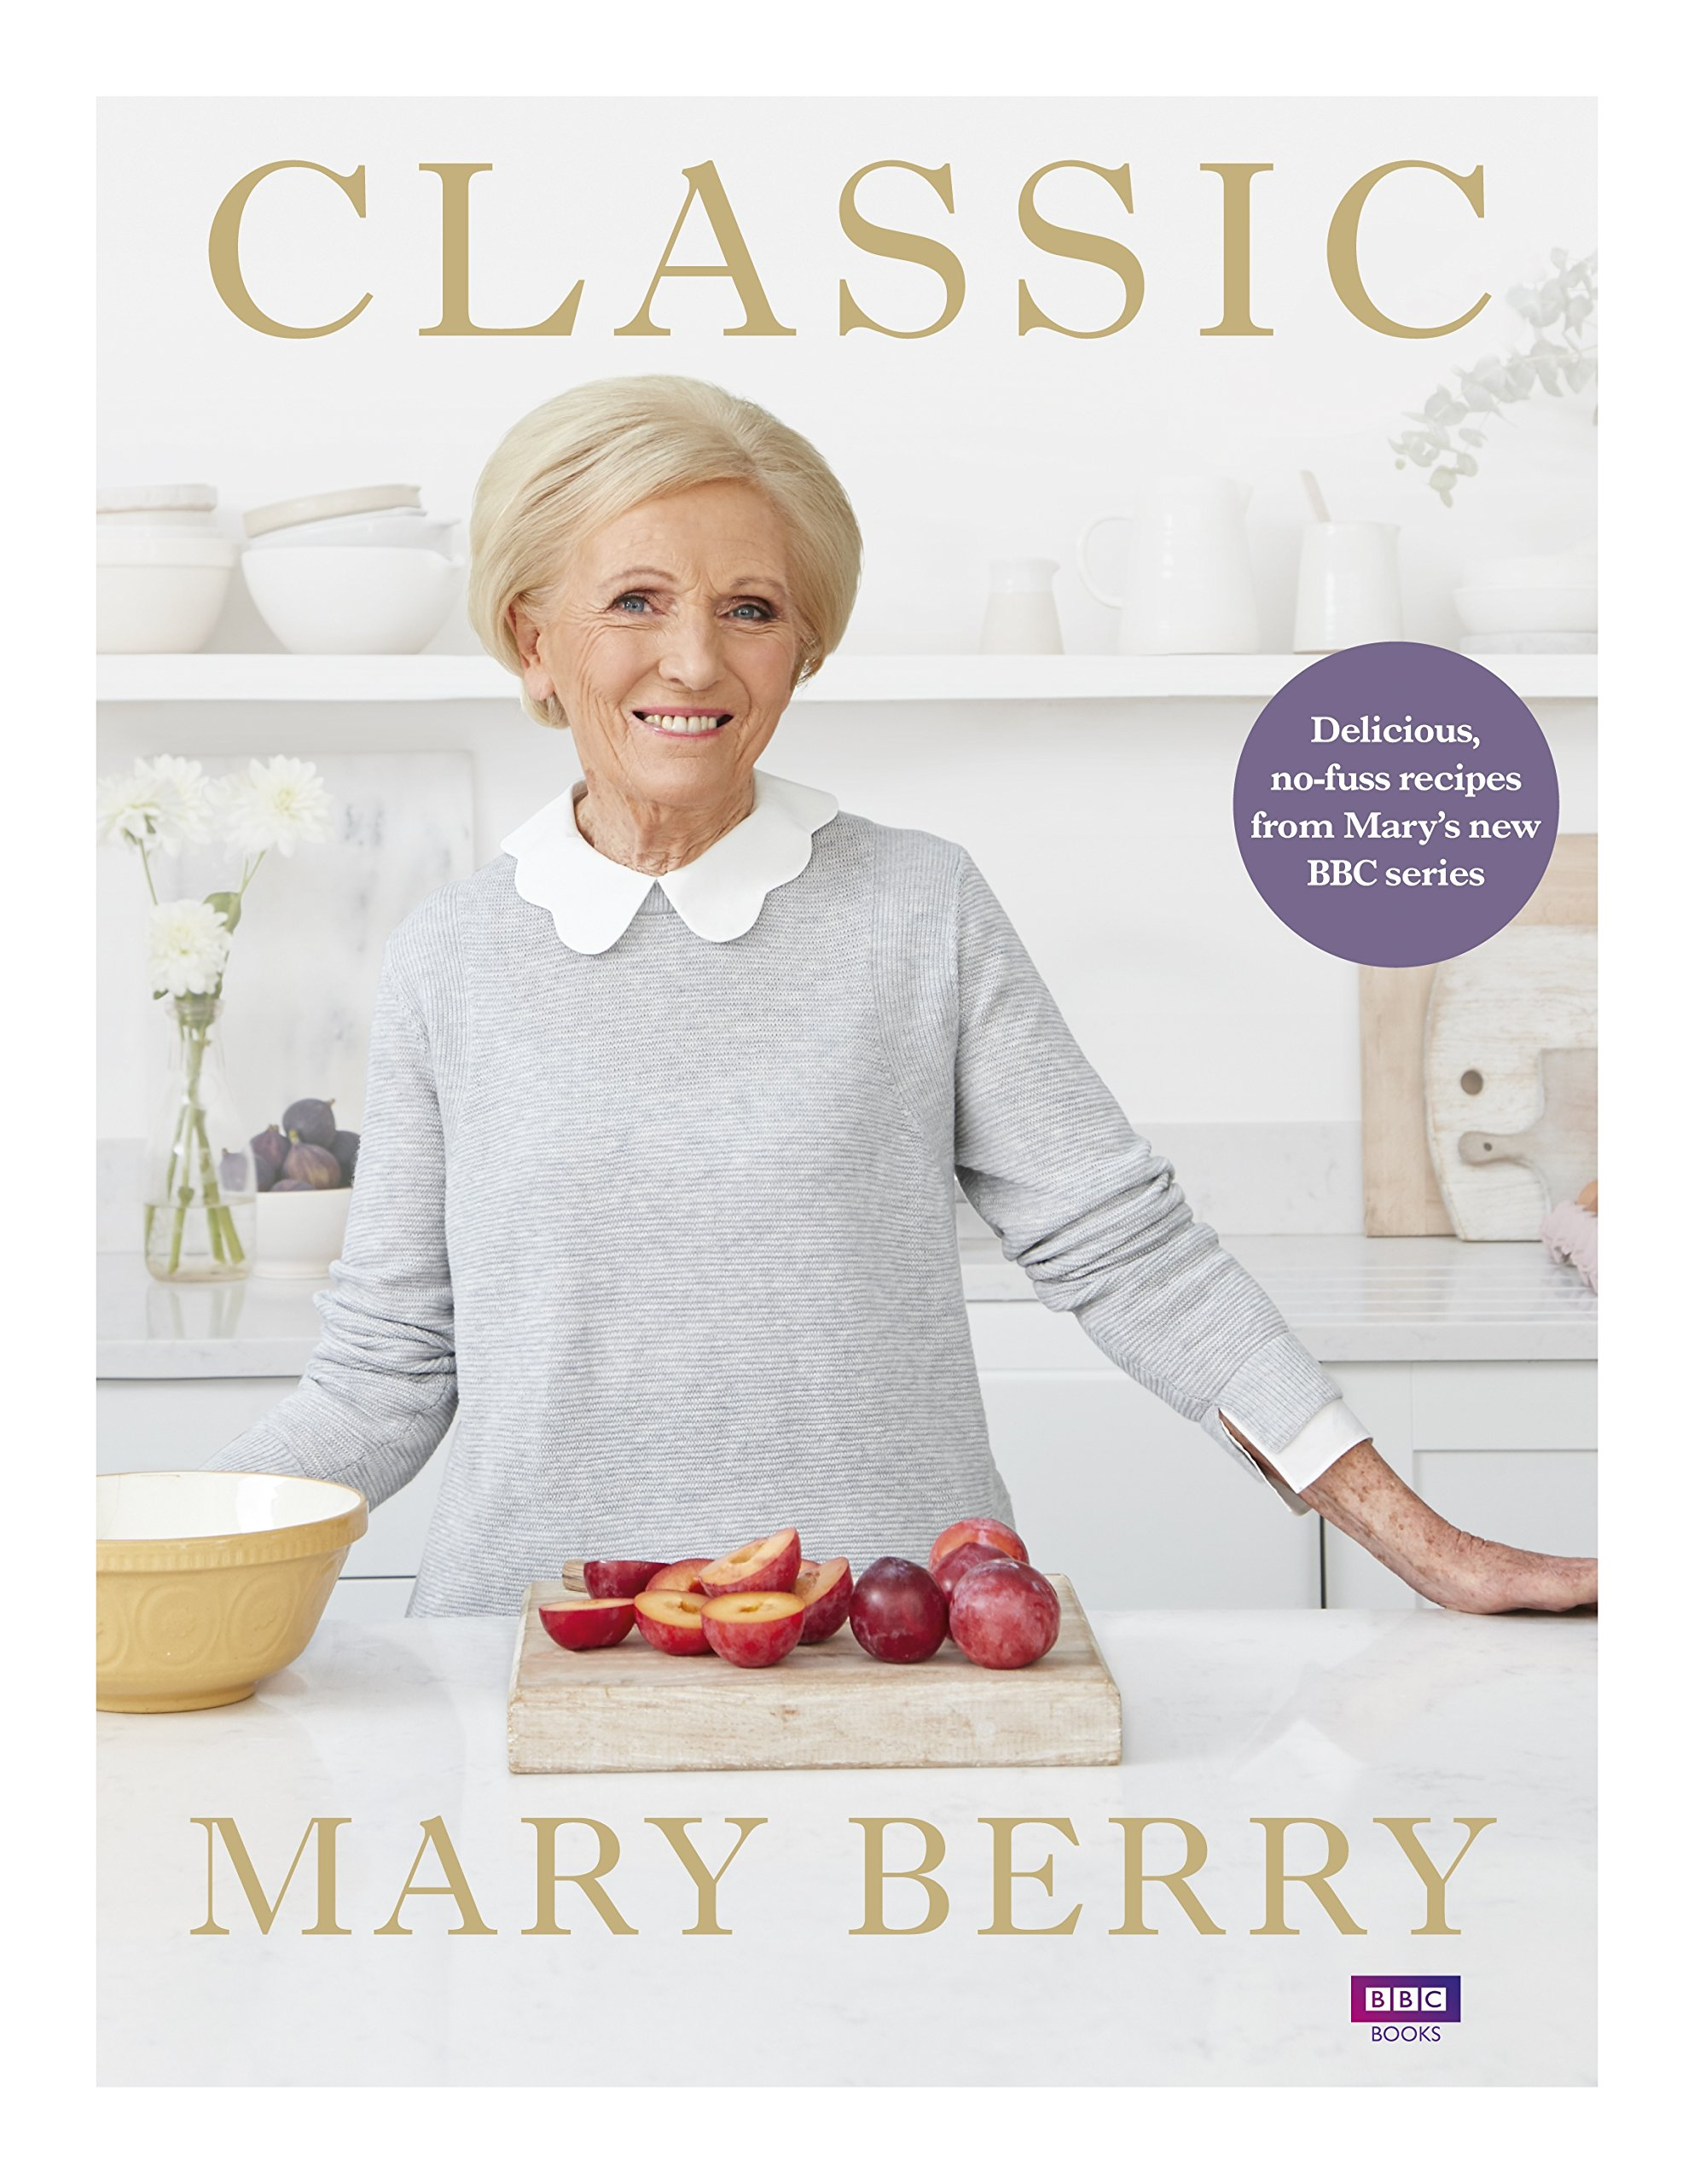 Classic Berry Mary 9781785943249 Amazon Com Books